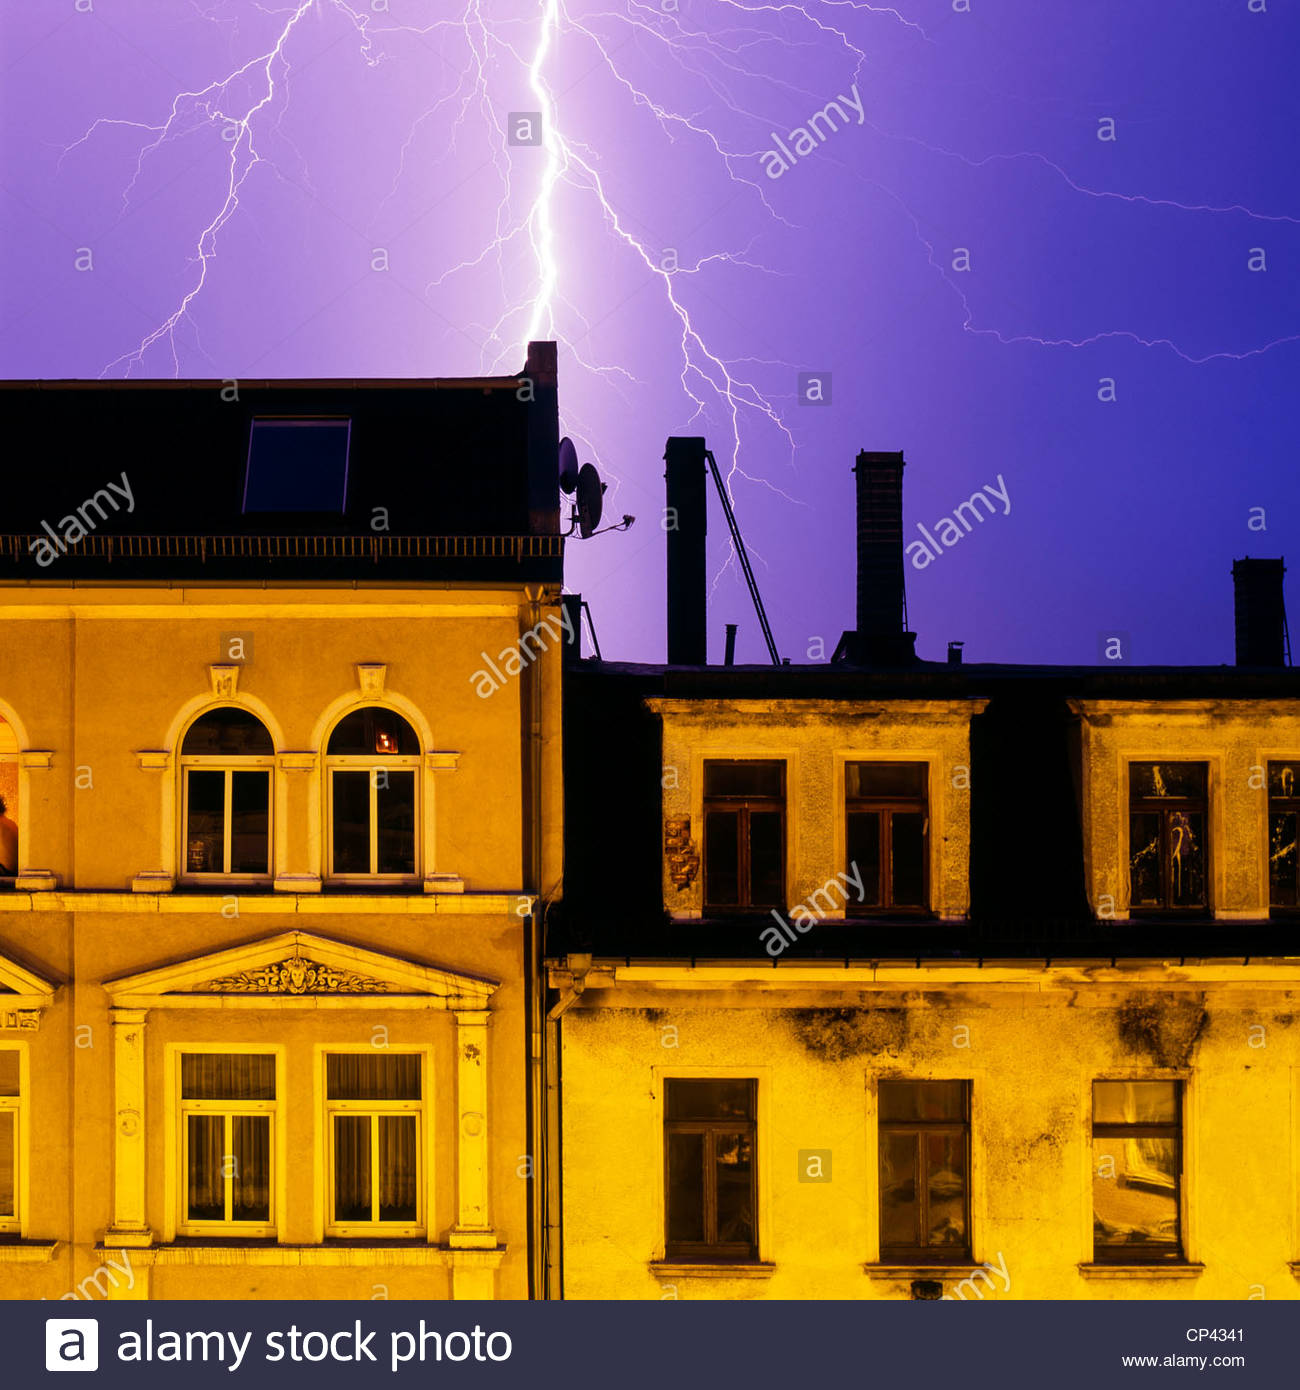 Lighting strikes over buildings in Plagwitz, Leipzig, Saxony, Germany - Stock Image